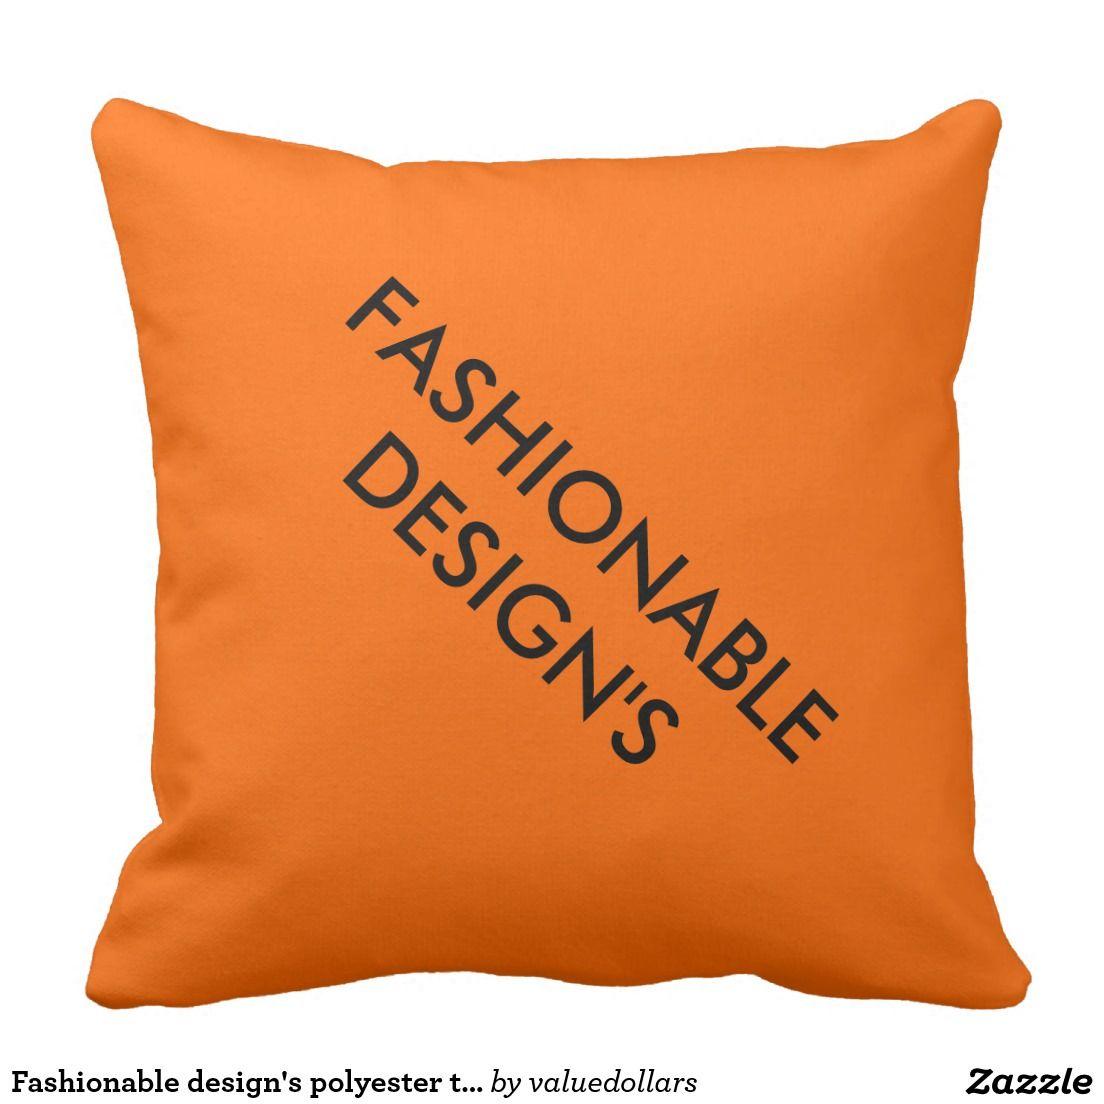 Fashionable designs polyester throw pillow